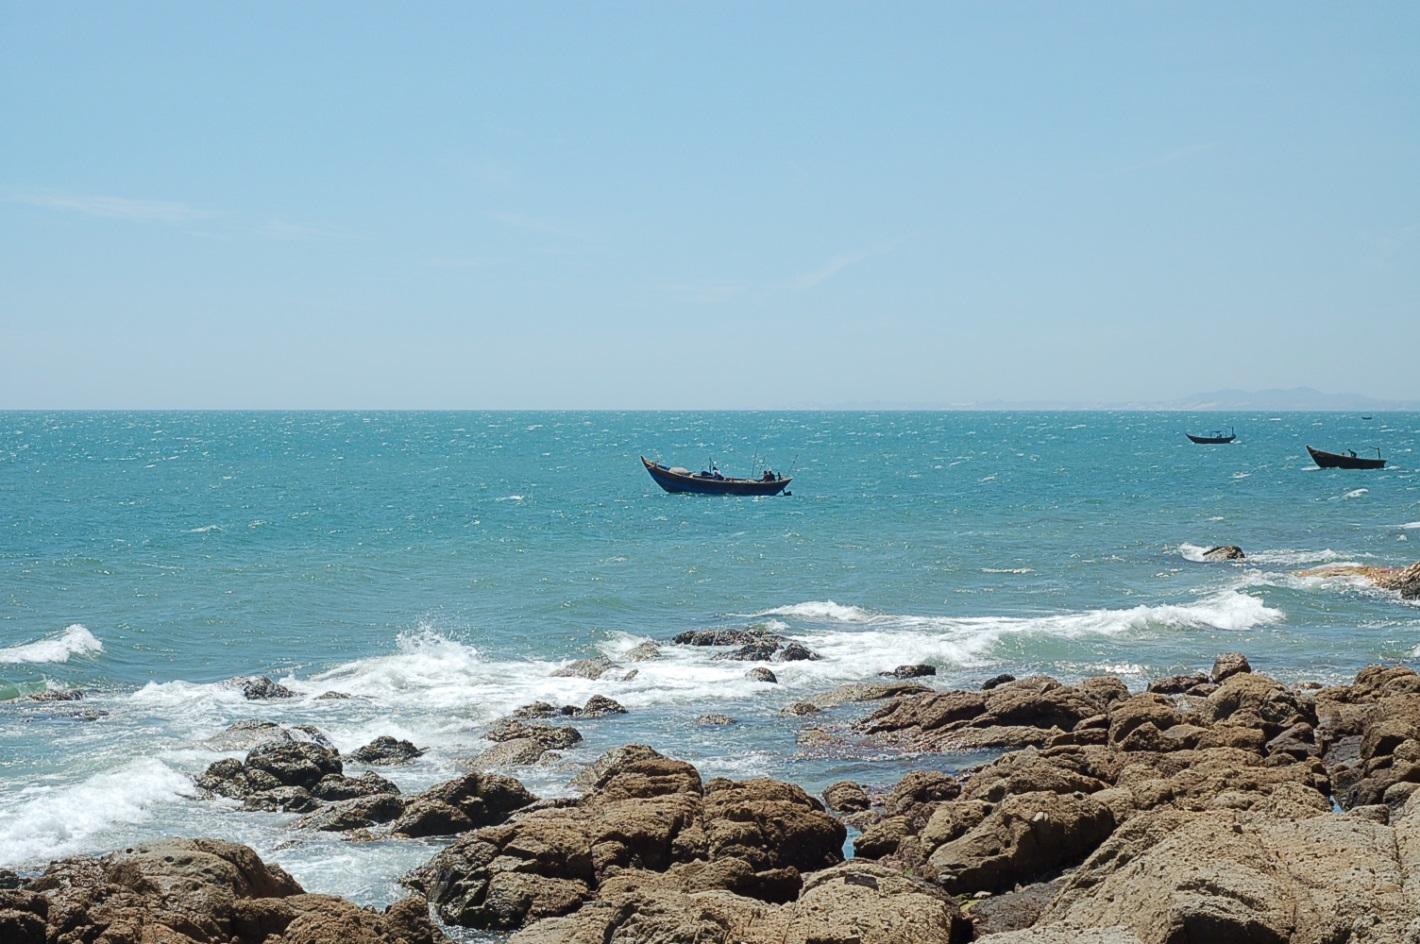 Mui Ne - a potential beautiful tourist destination in Vietnam